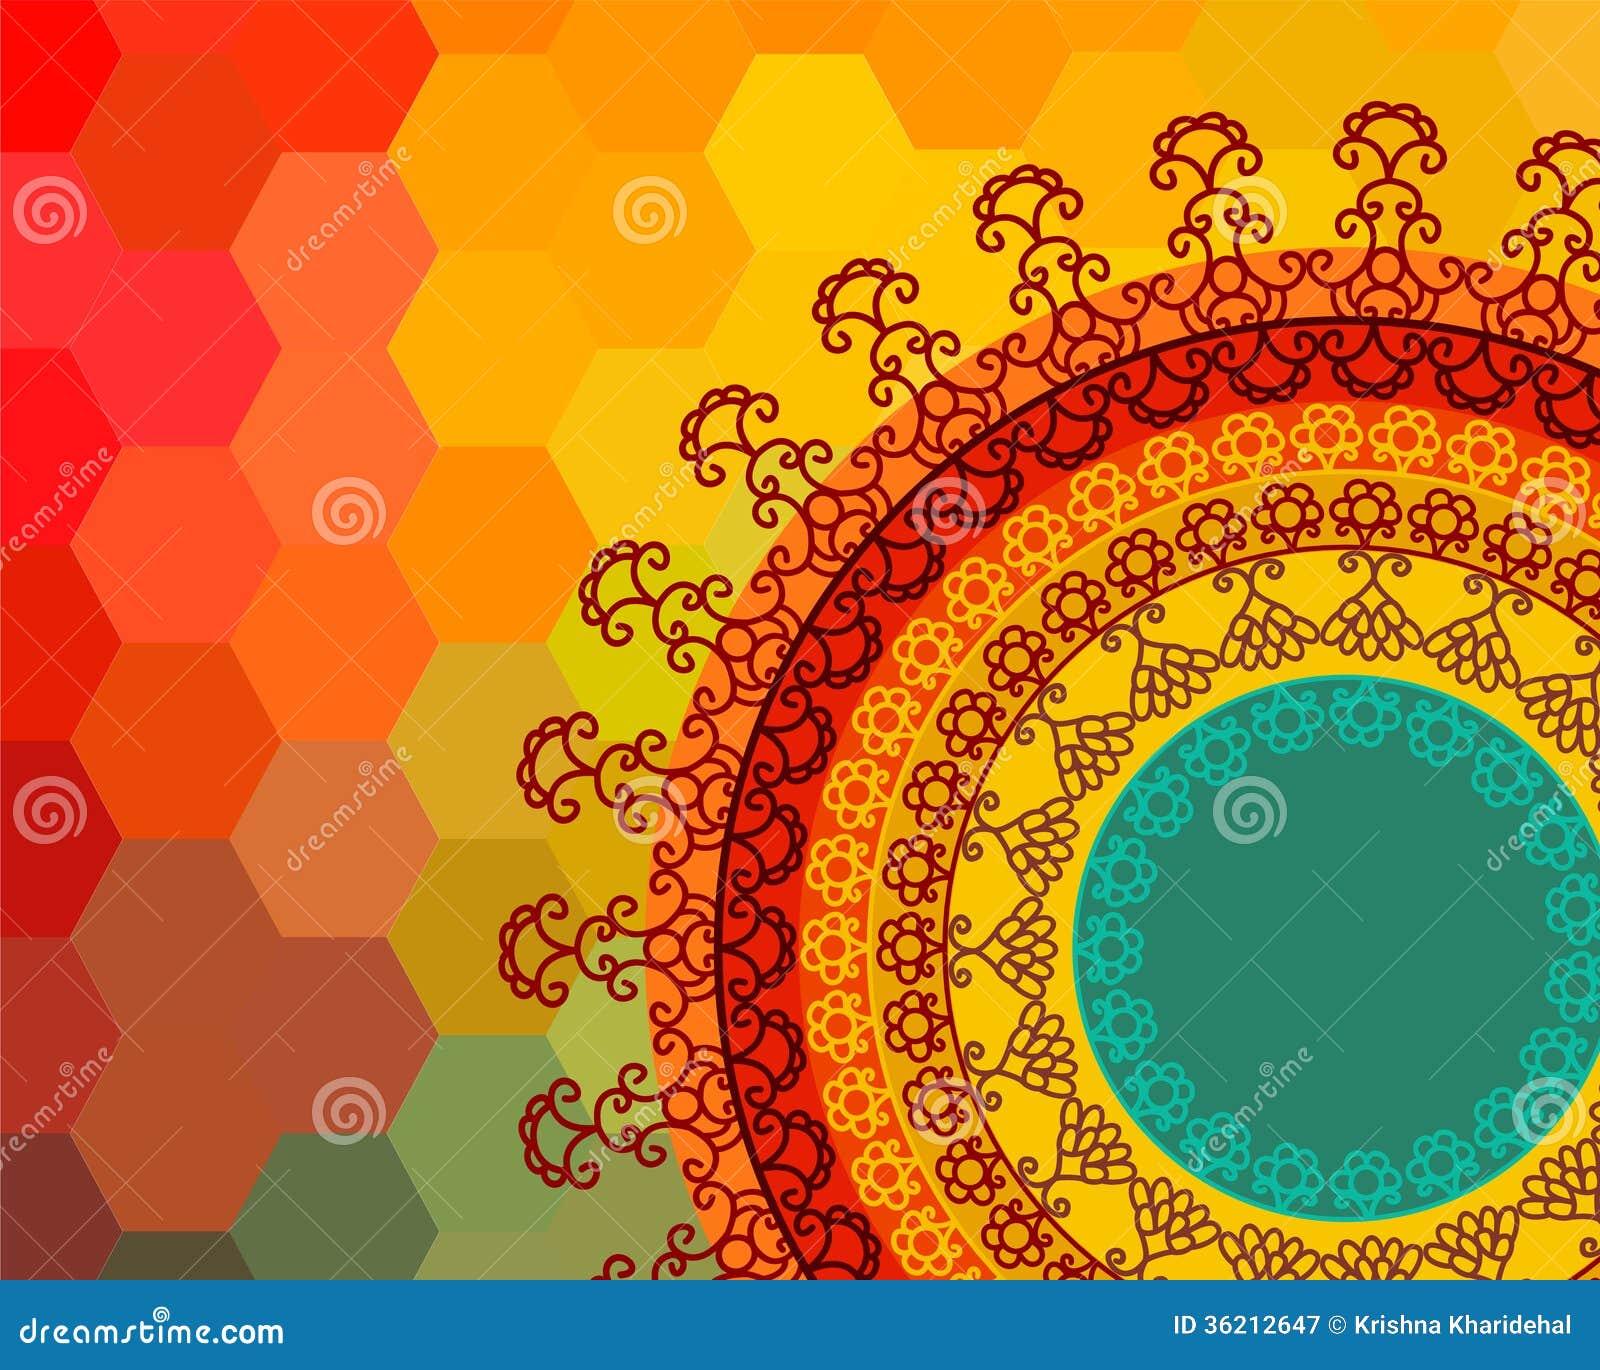 Colour Henna Mandala Background Stock Vector Illustration Of